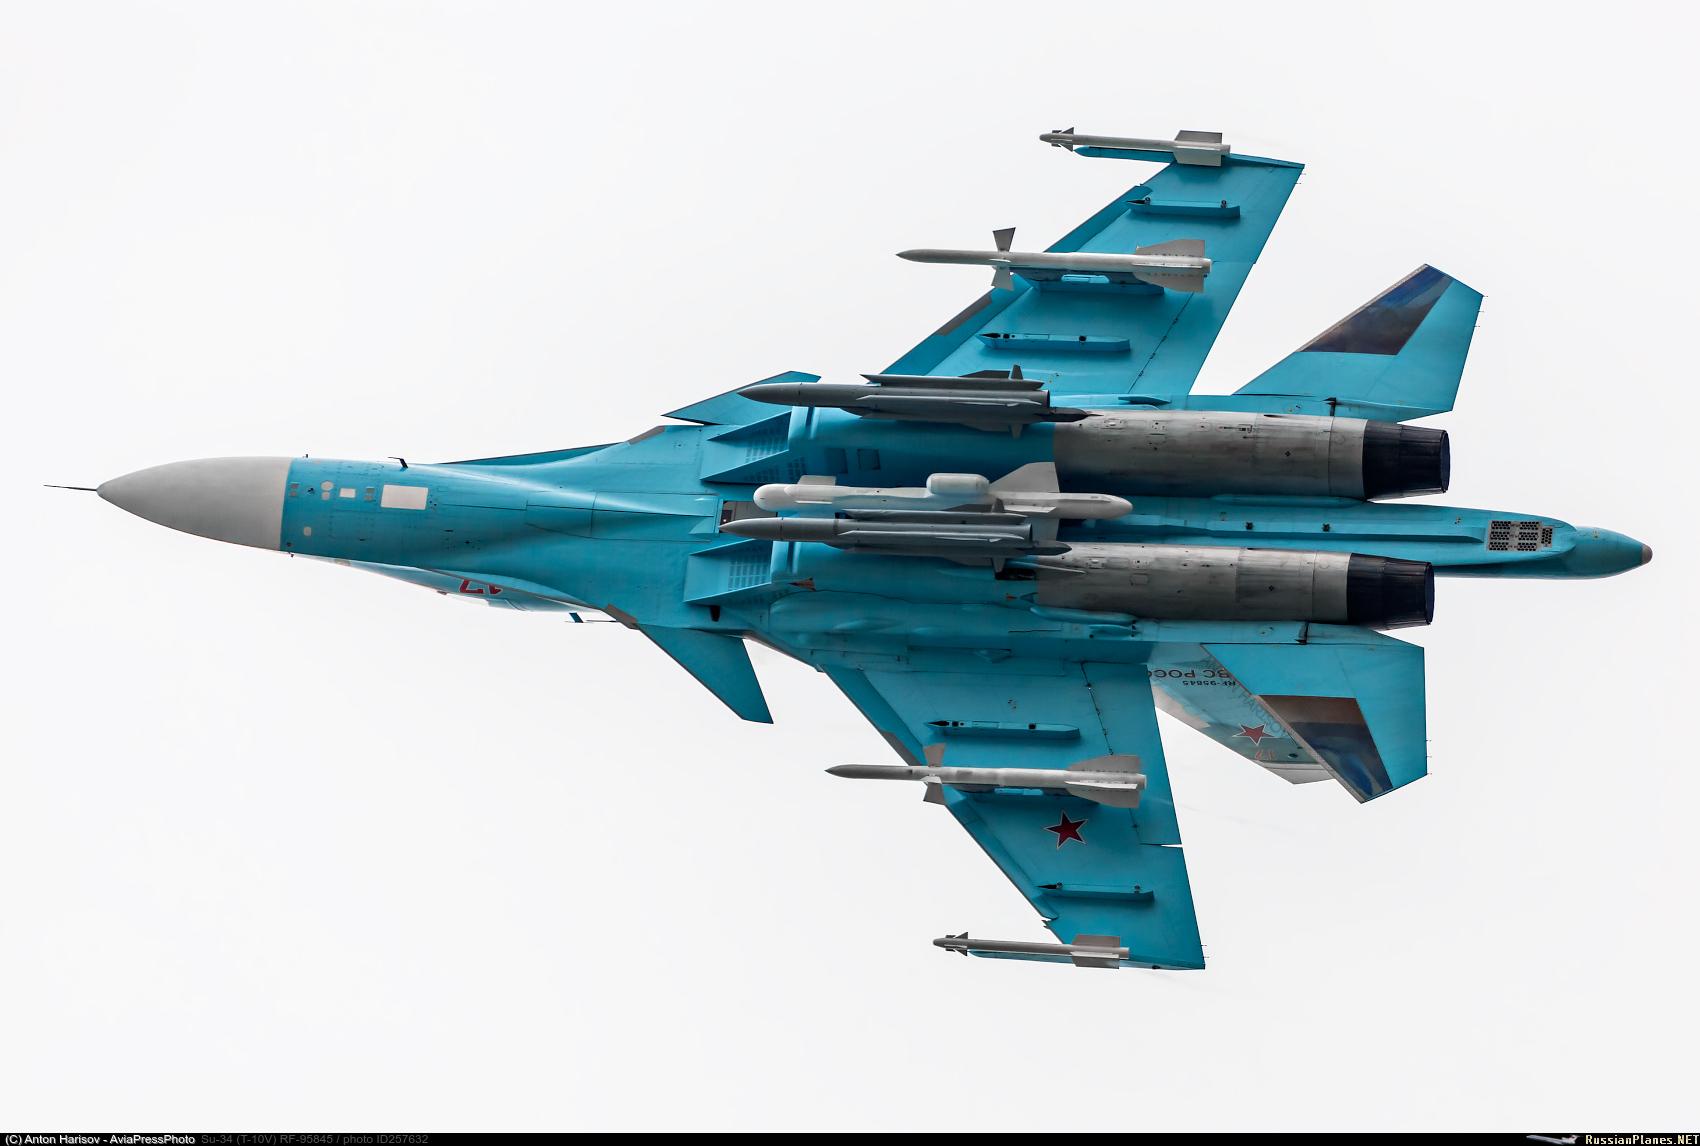 https://russianplanes.net/images/to258000/257632.jpg